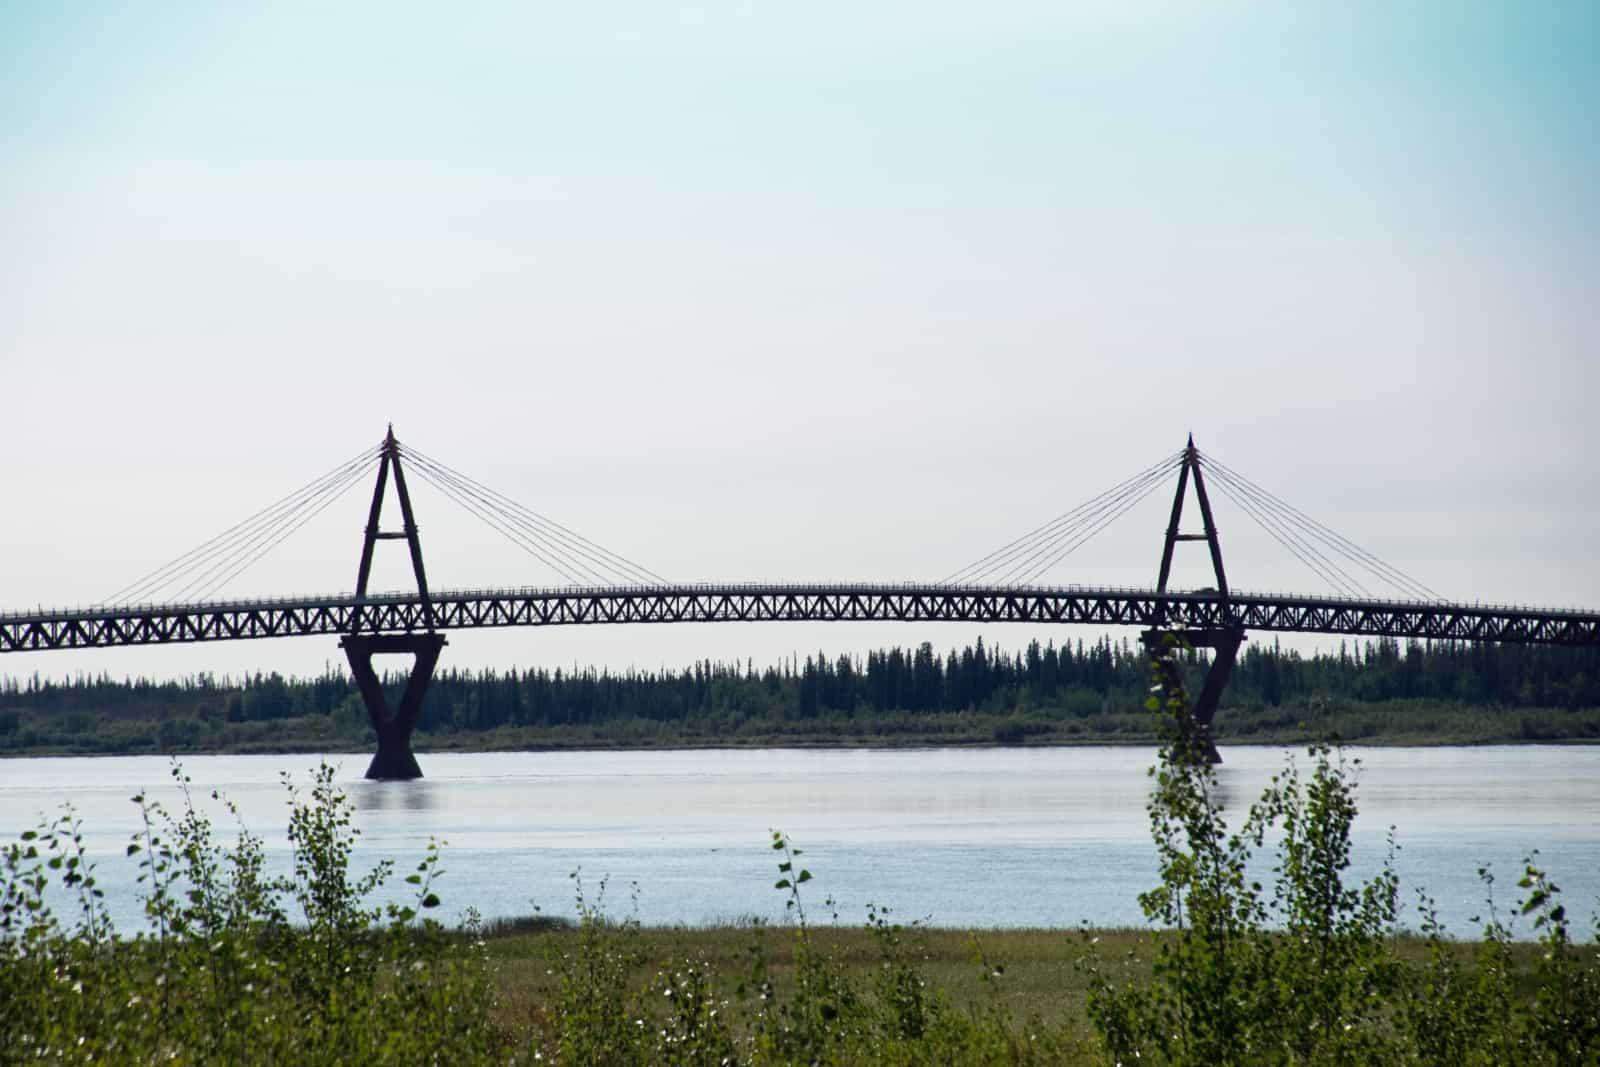 Über 1,6 Kilometer lang, über 1,1 Kilometer überspannt sie den Mackenzie River bei Fort Providence. Foto Daniela Ganz